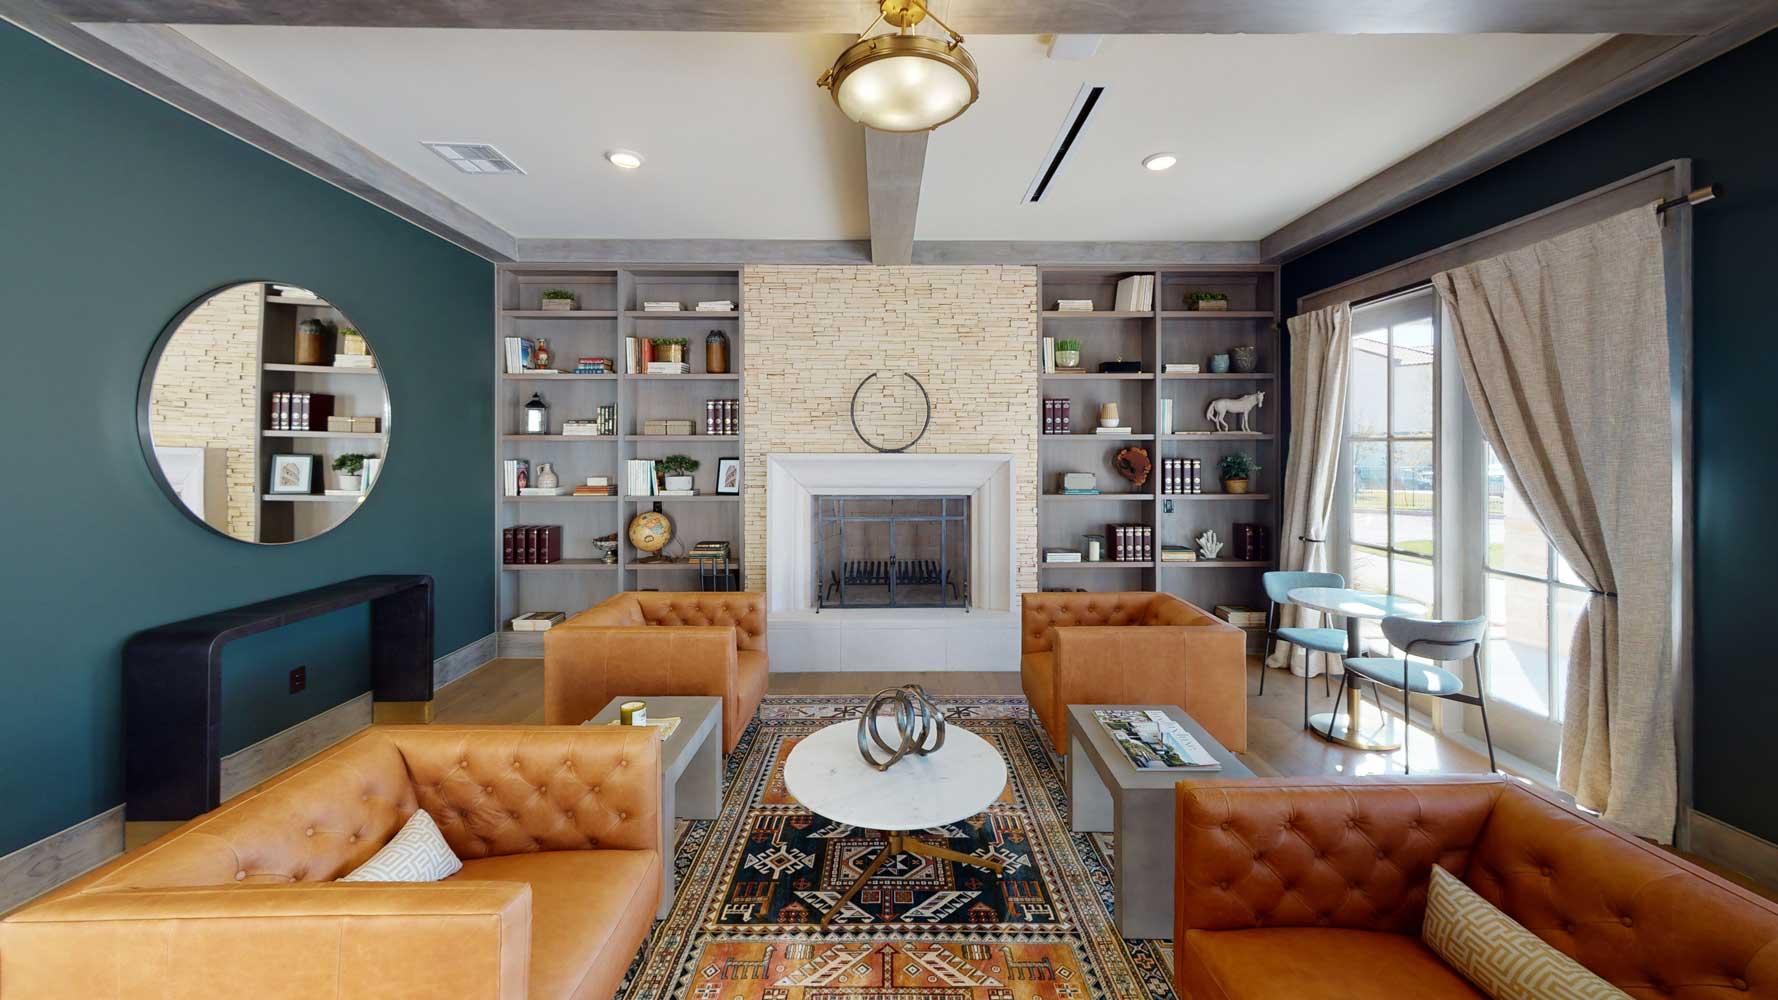 Living Room at Oxford at Santa Clara Apartments in Pflugerville, Texas